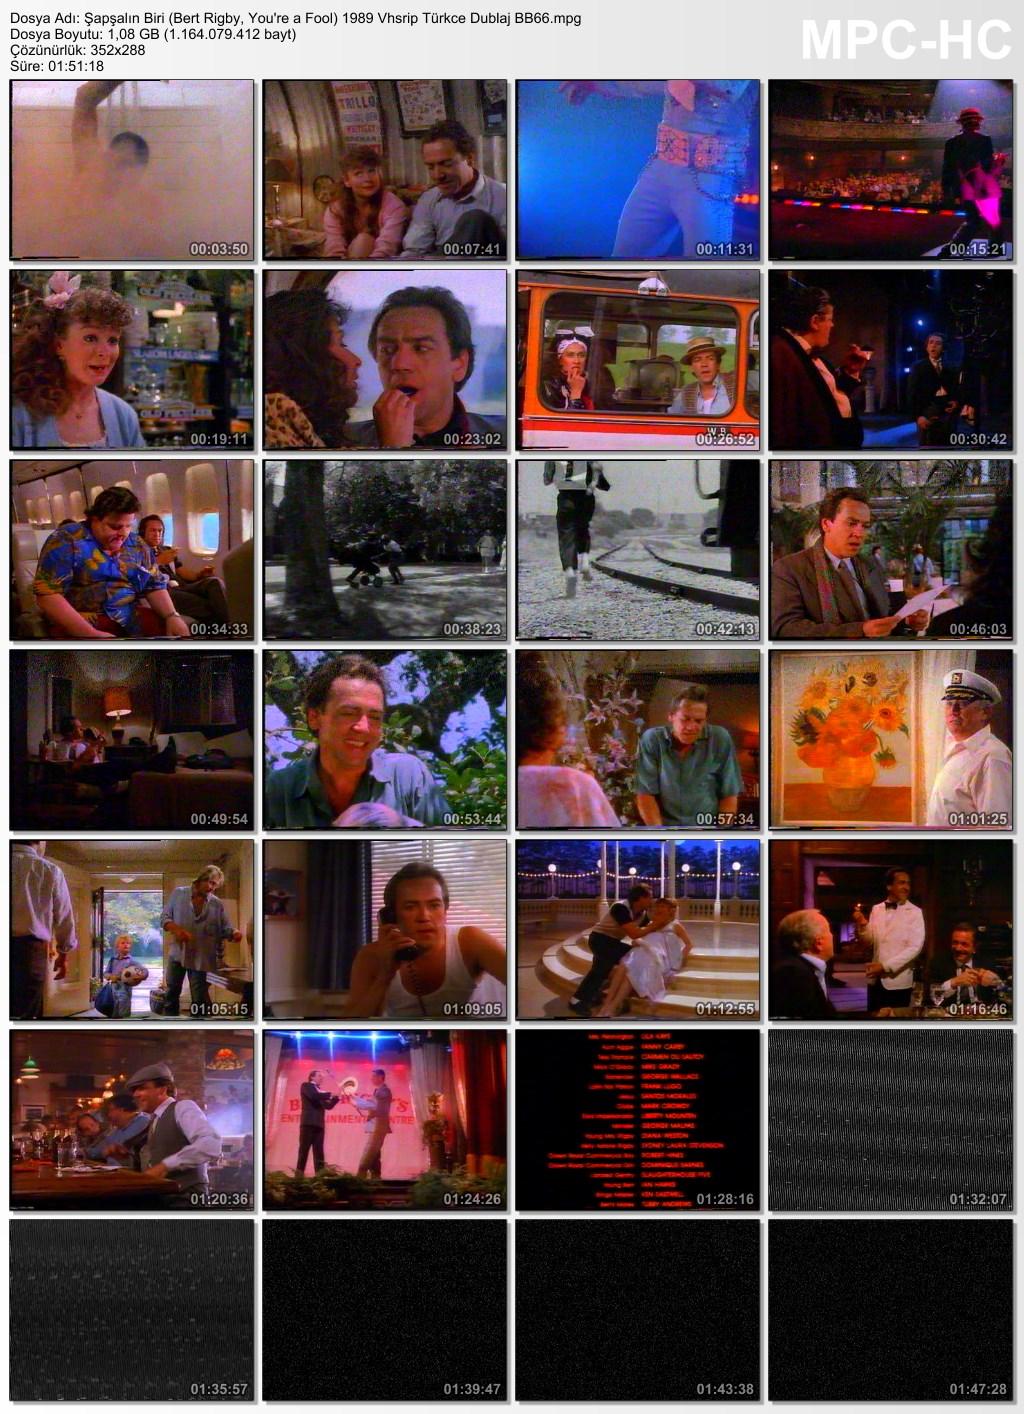 Şapşalın Biri (Bert Rigby, You're a Fool) 1989 Vhsrip Türkce Dublaj BB66 - barbarus